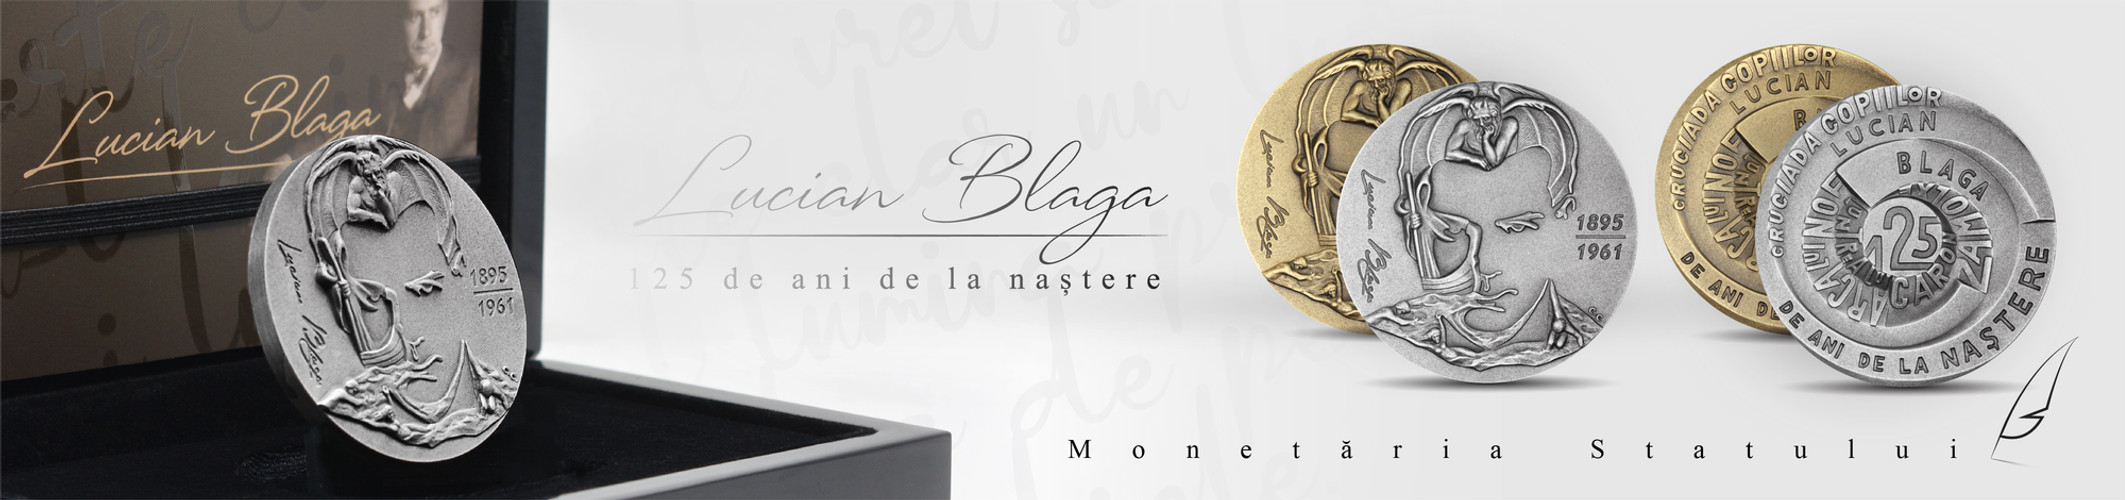 lansare banner site Lucian Blaga-01 (002